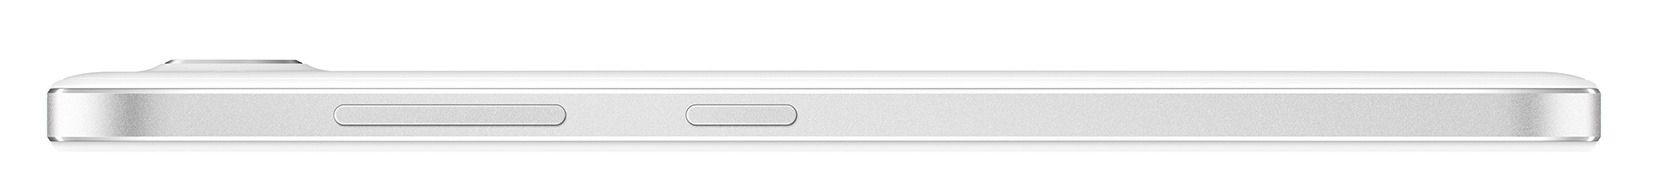 Lumia 650 er 6,9 millimeter tykk.